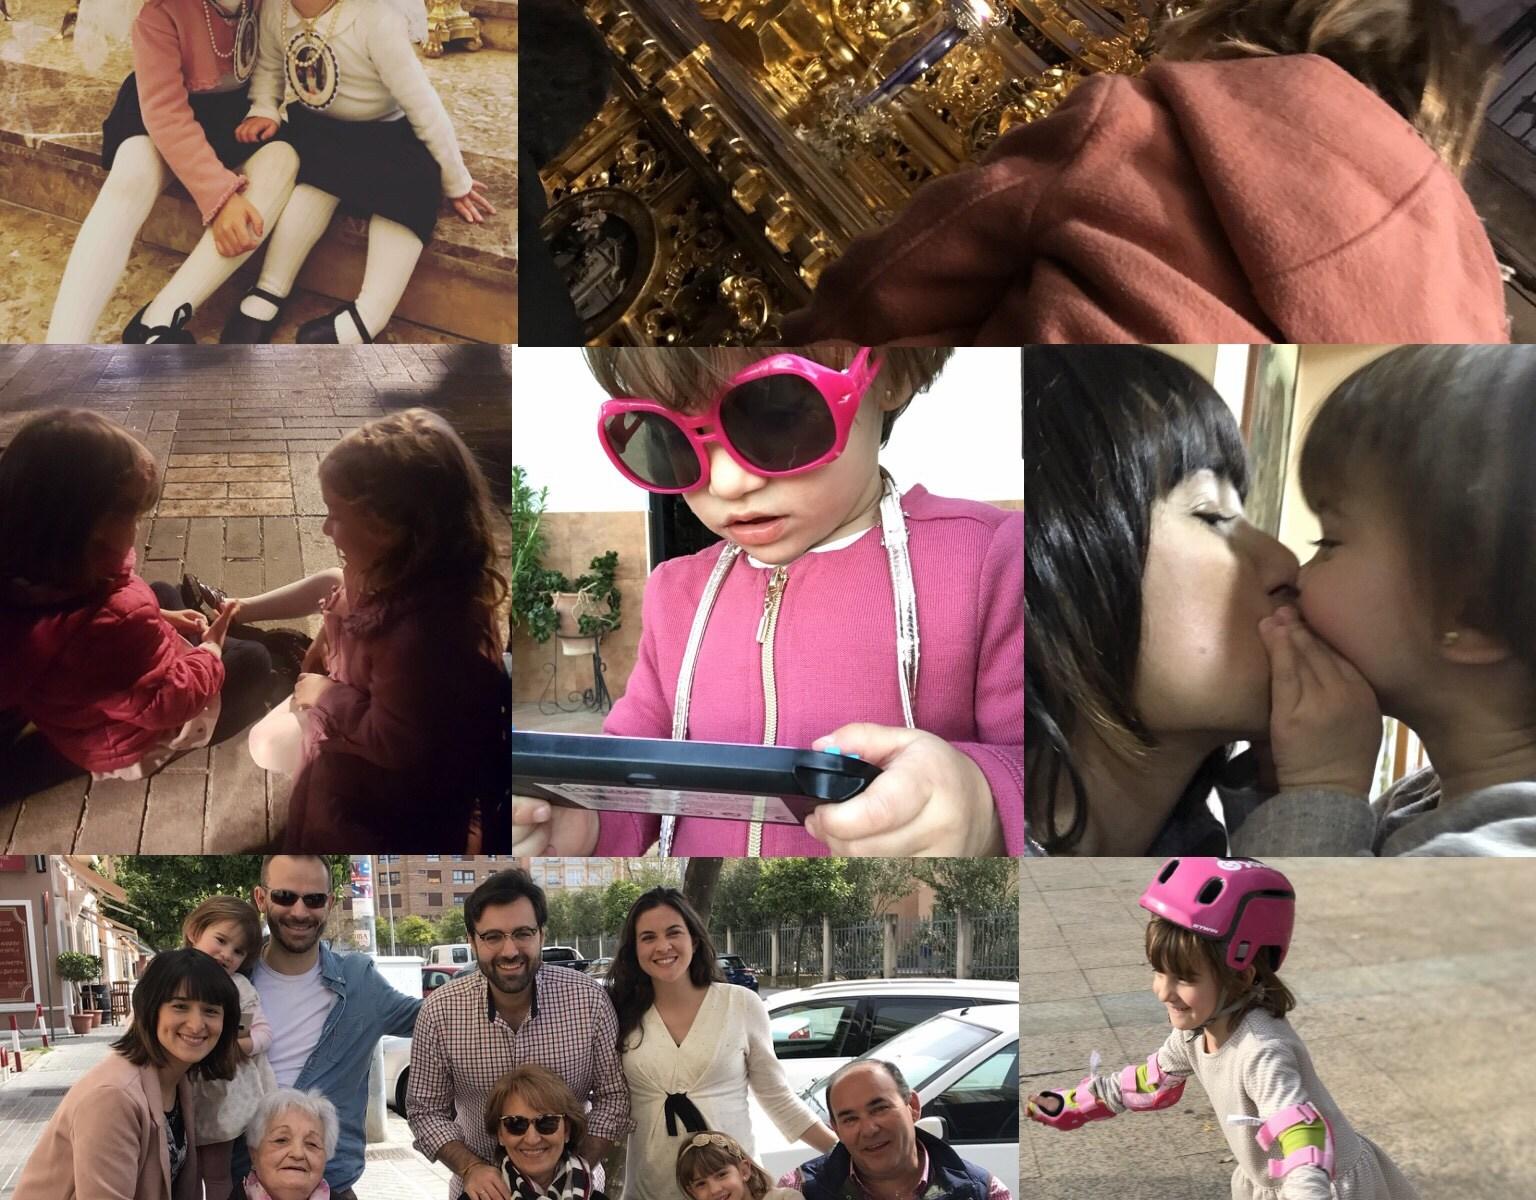 malamadre malaprofesional semana santa en familia tips recuerdos risas conciliacion conciliar